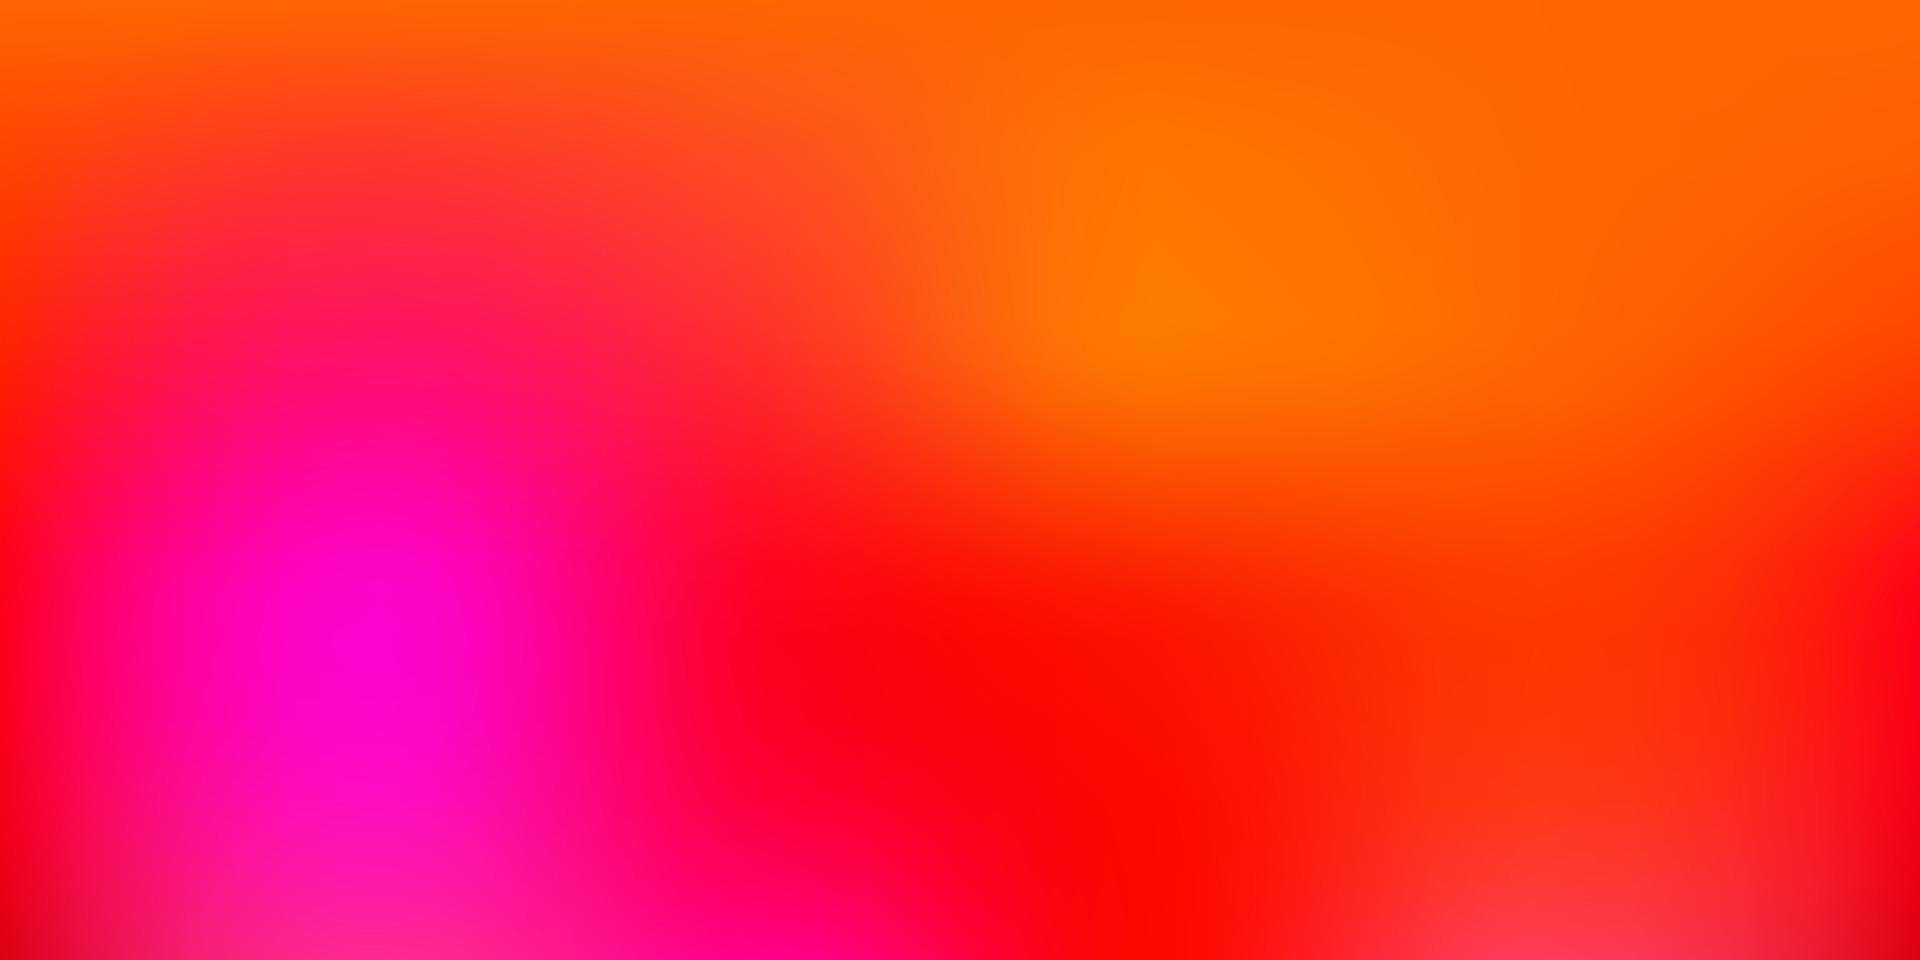 hellrosa, gelbes Vektorgradienten-Unschärfemuster. vektor